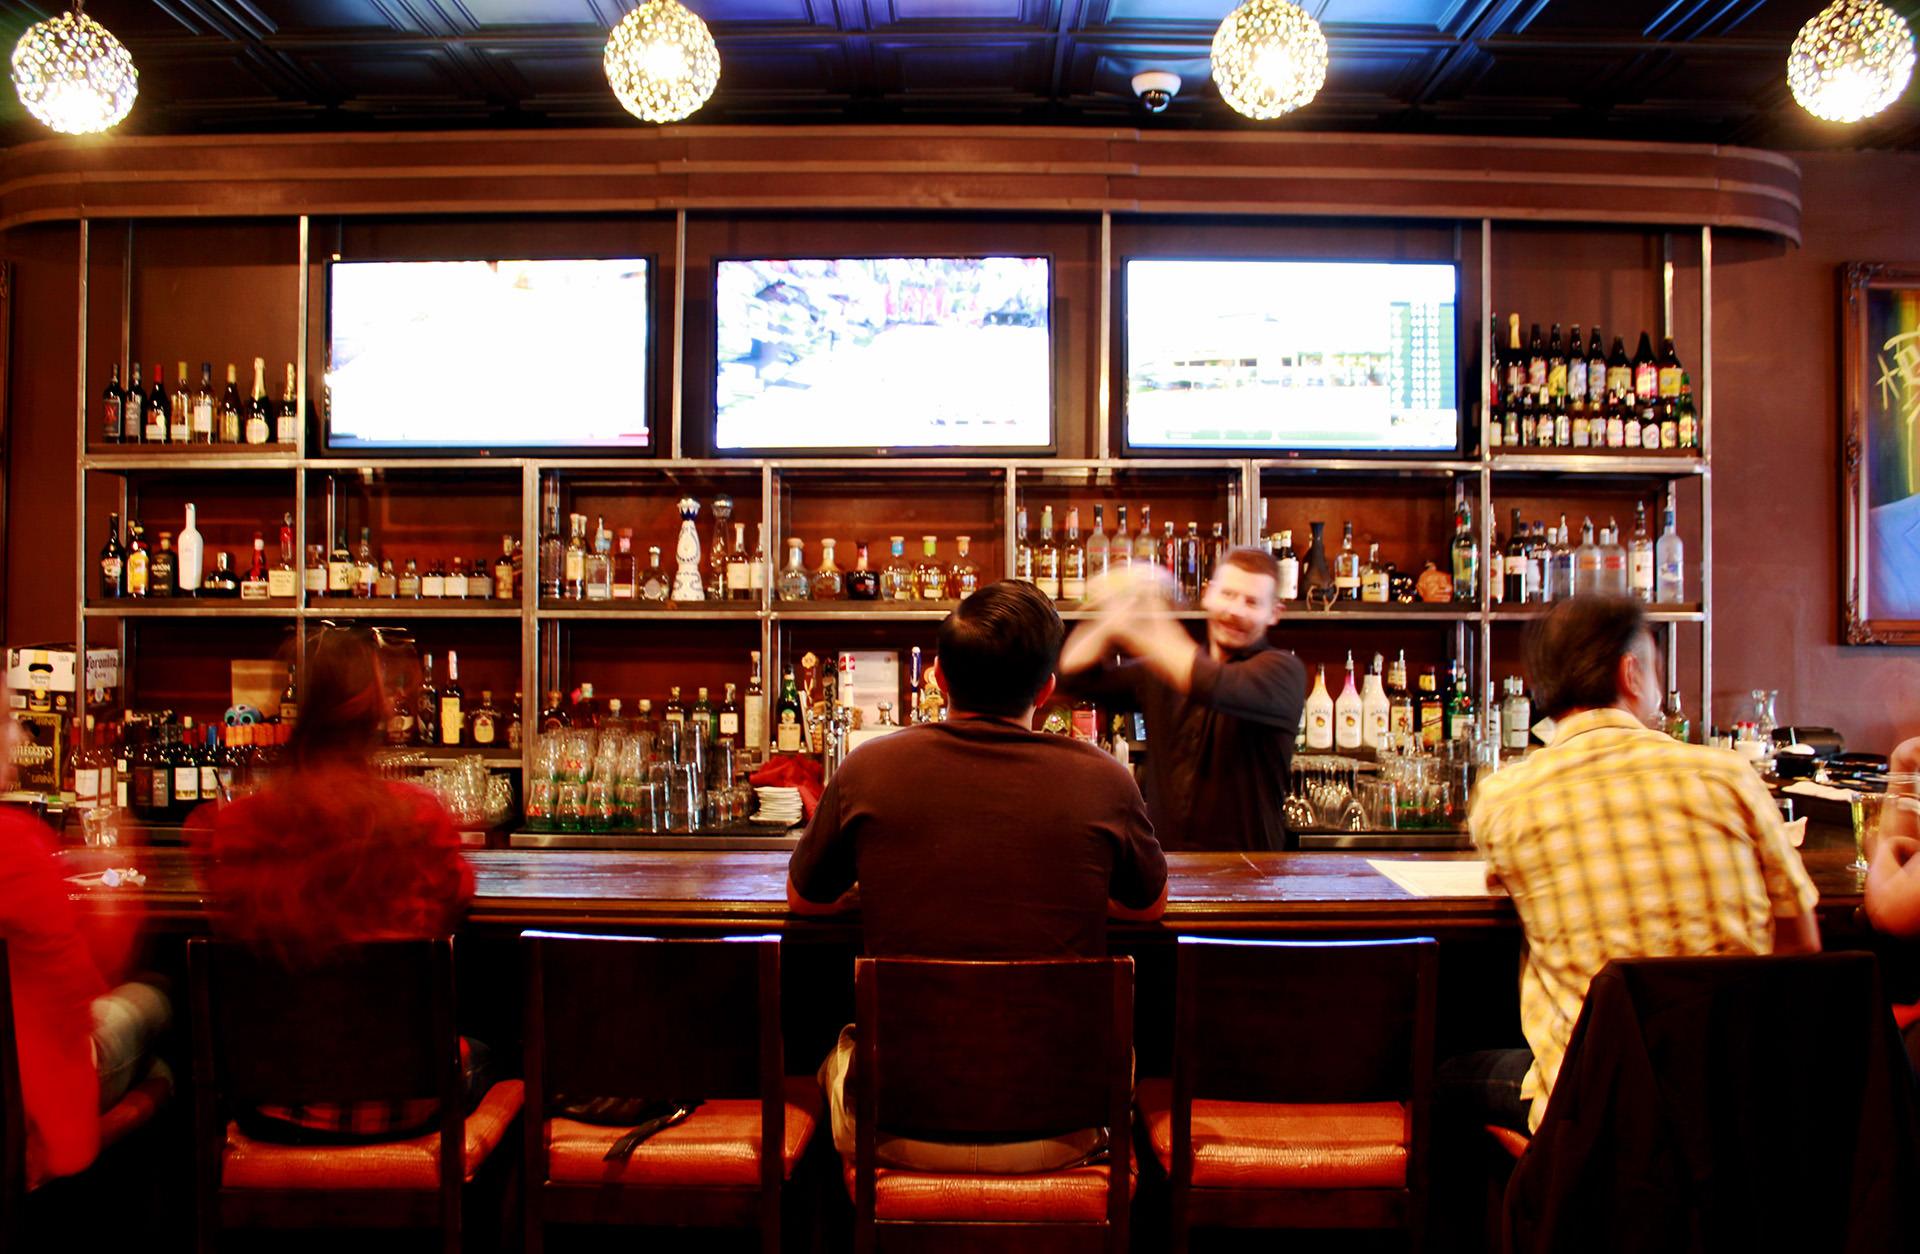 bartender1 psd10.JPG